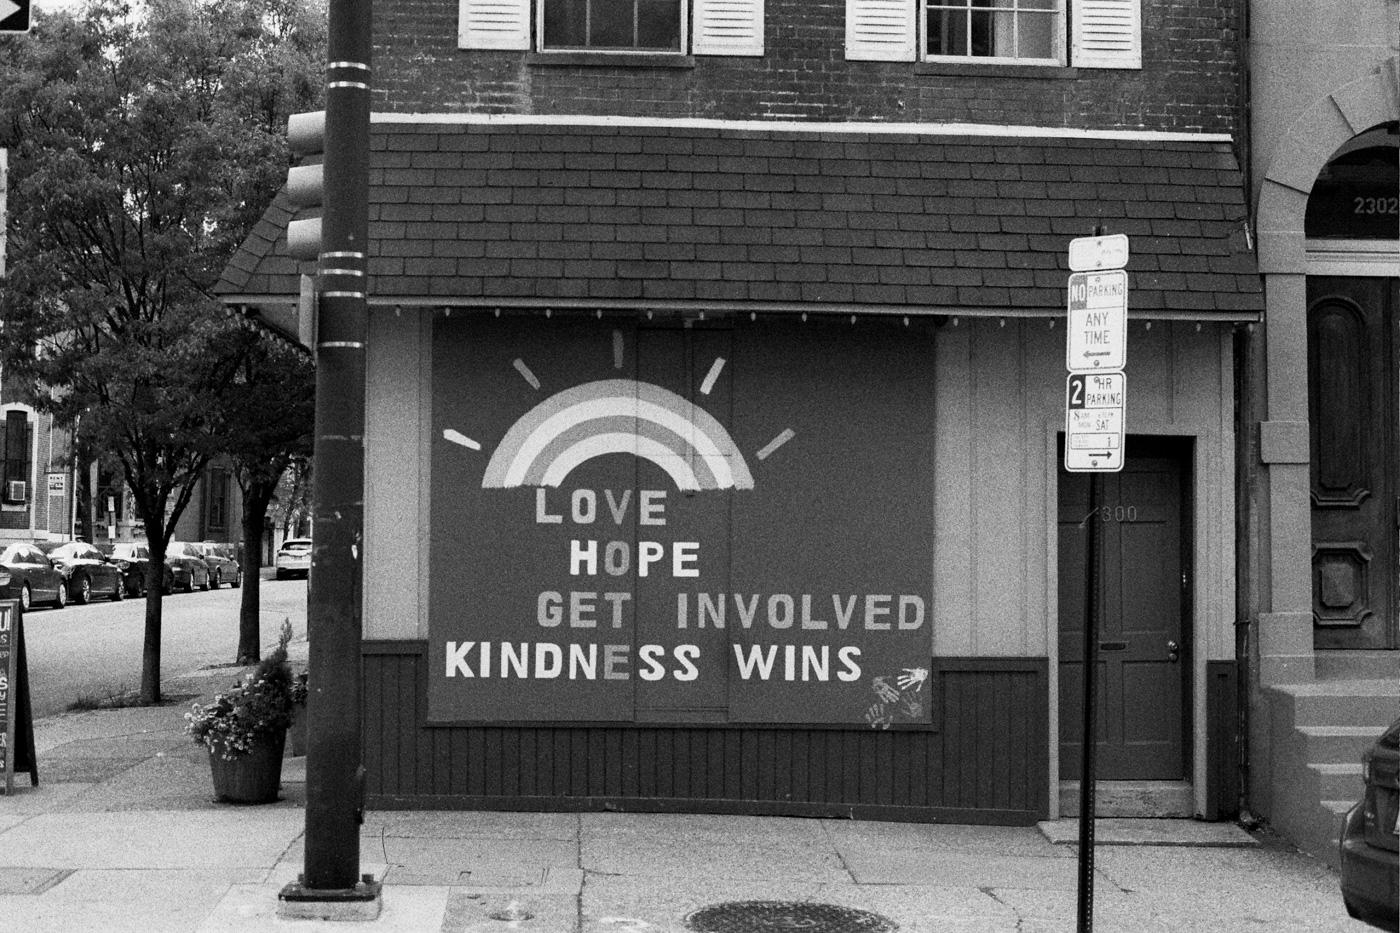 Love Hope Get Involved Kindness Wins